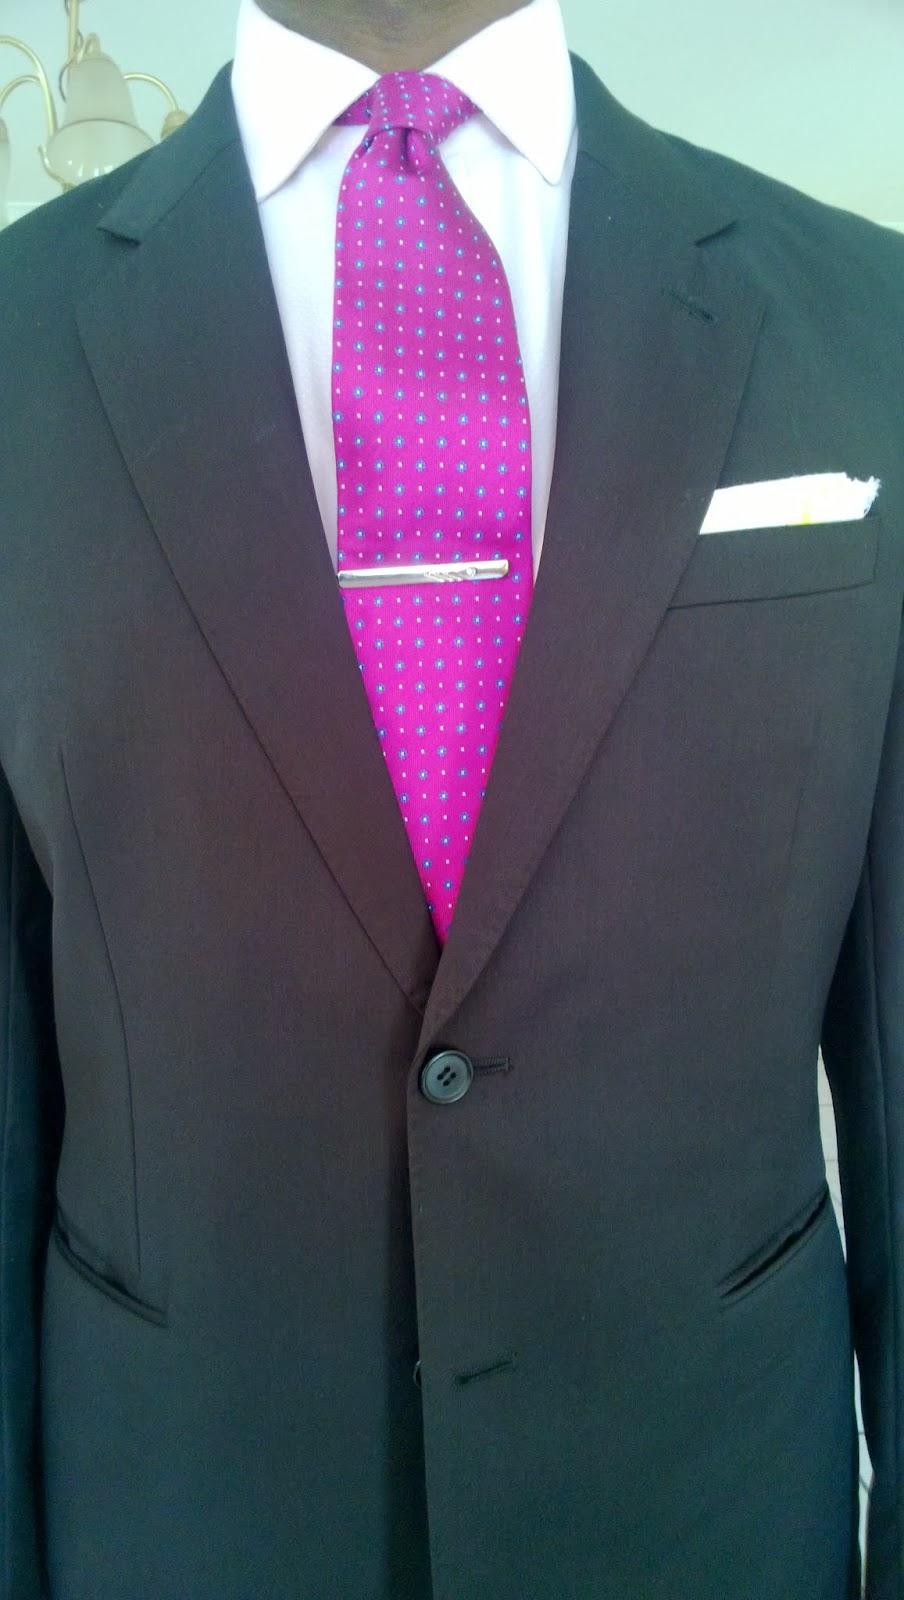 black suit blue shirt yellow tie male models picture